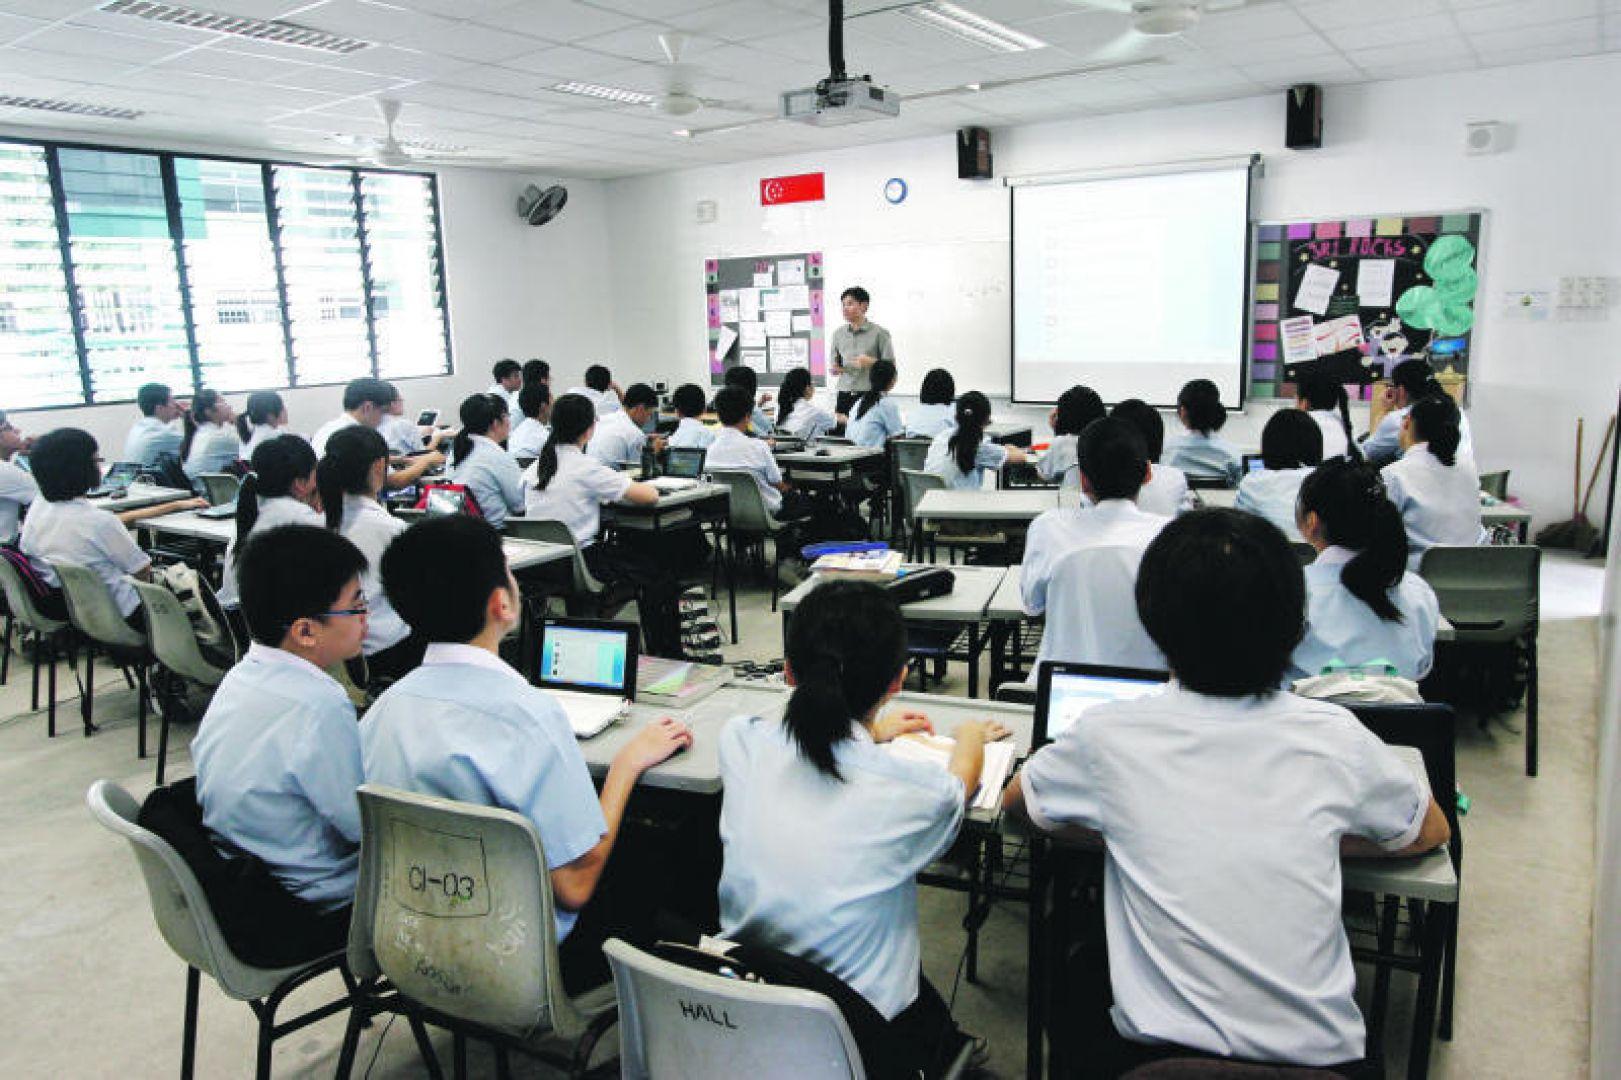 Сингапурские дети в школе на занятии